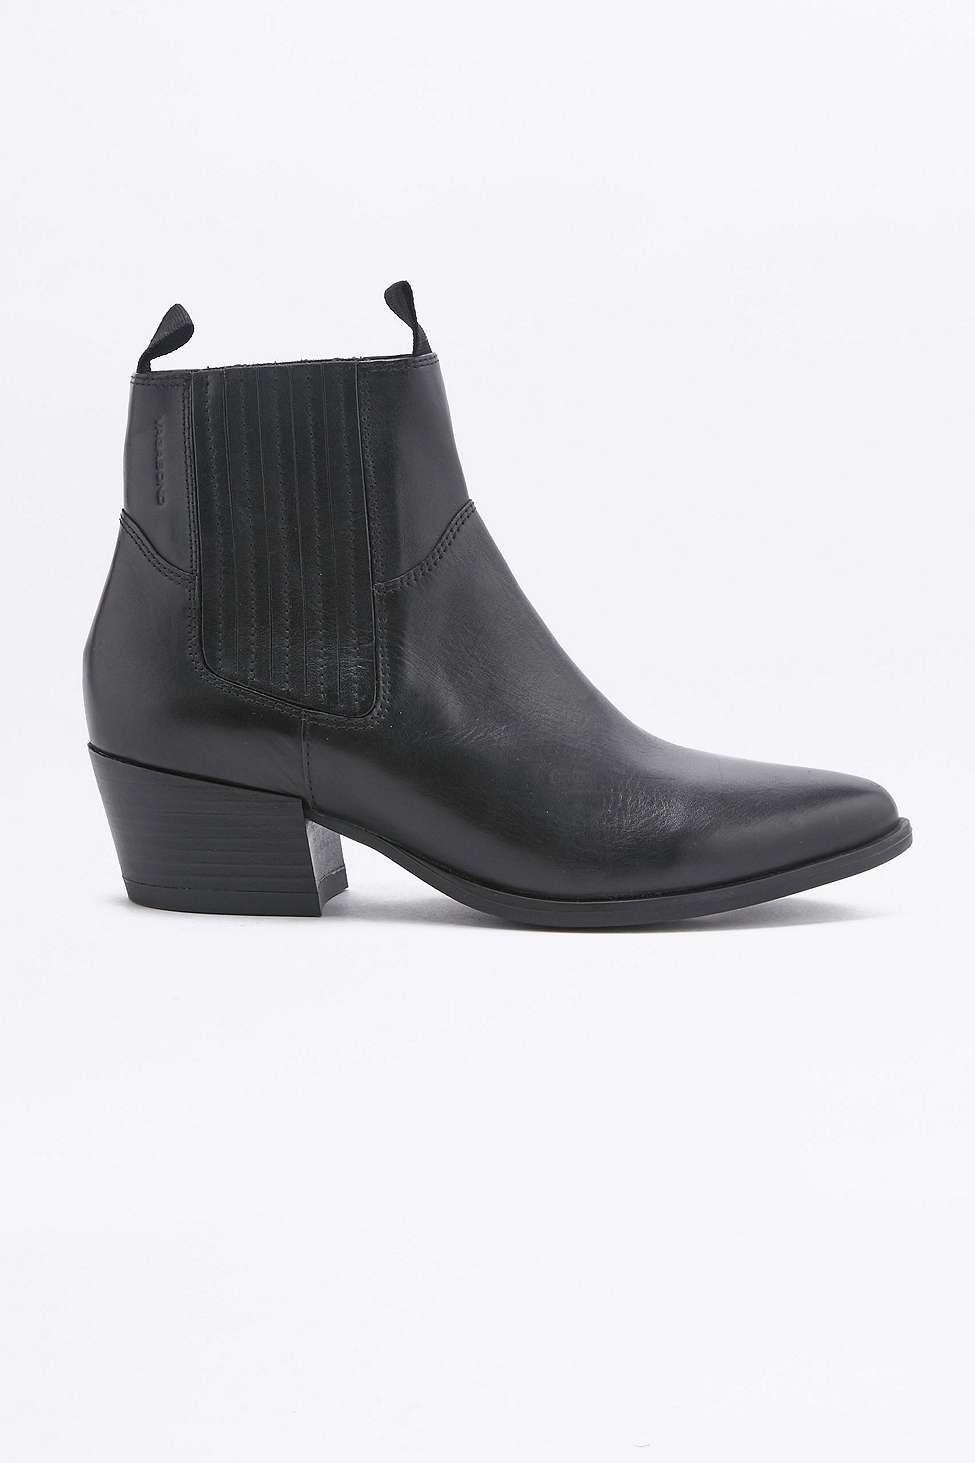 76abf319f3a Vagabond Mandy Western Black Chelsea Ankle Boots | Shoes | Black ...